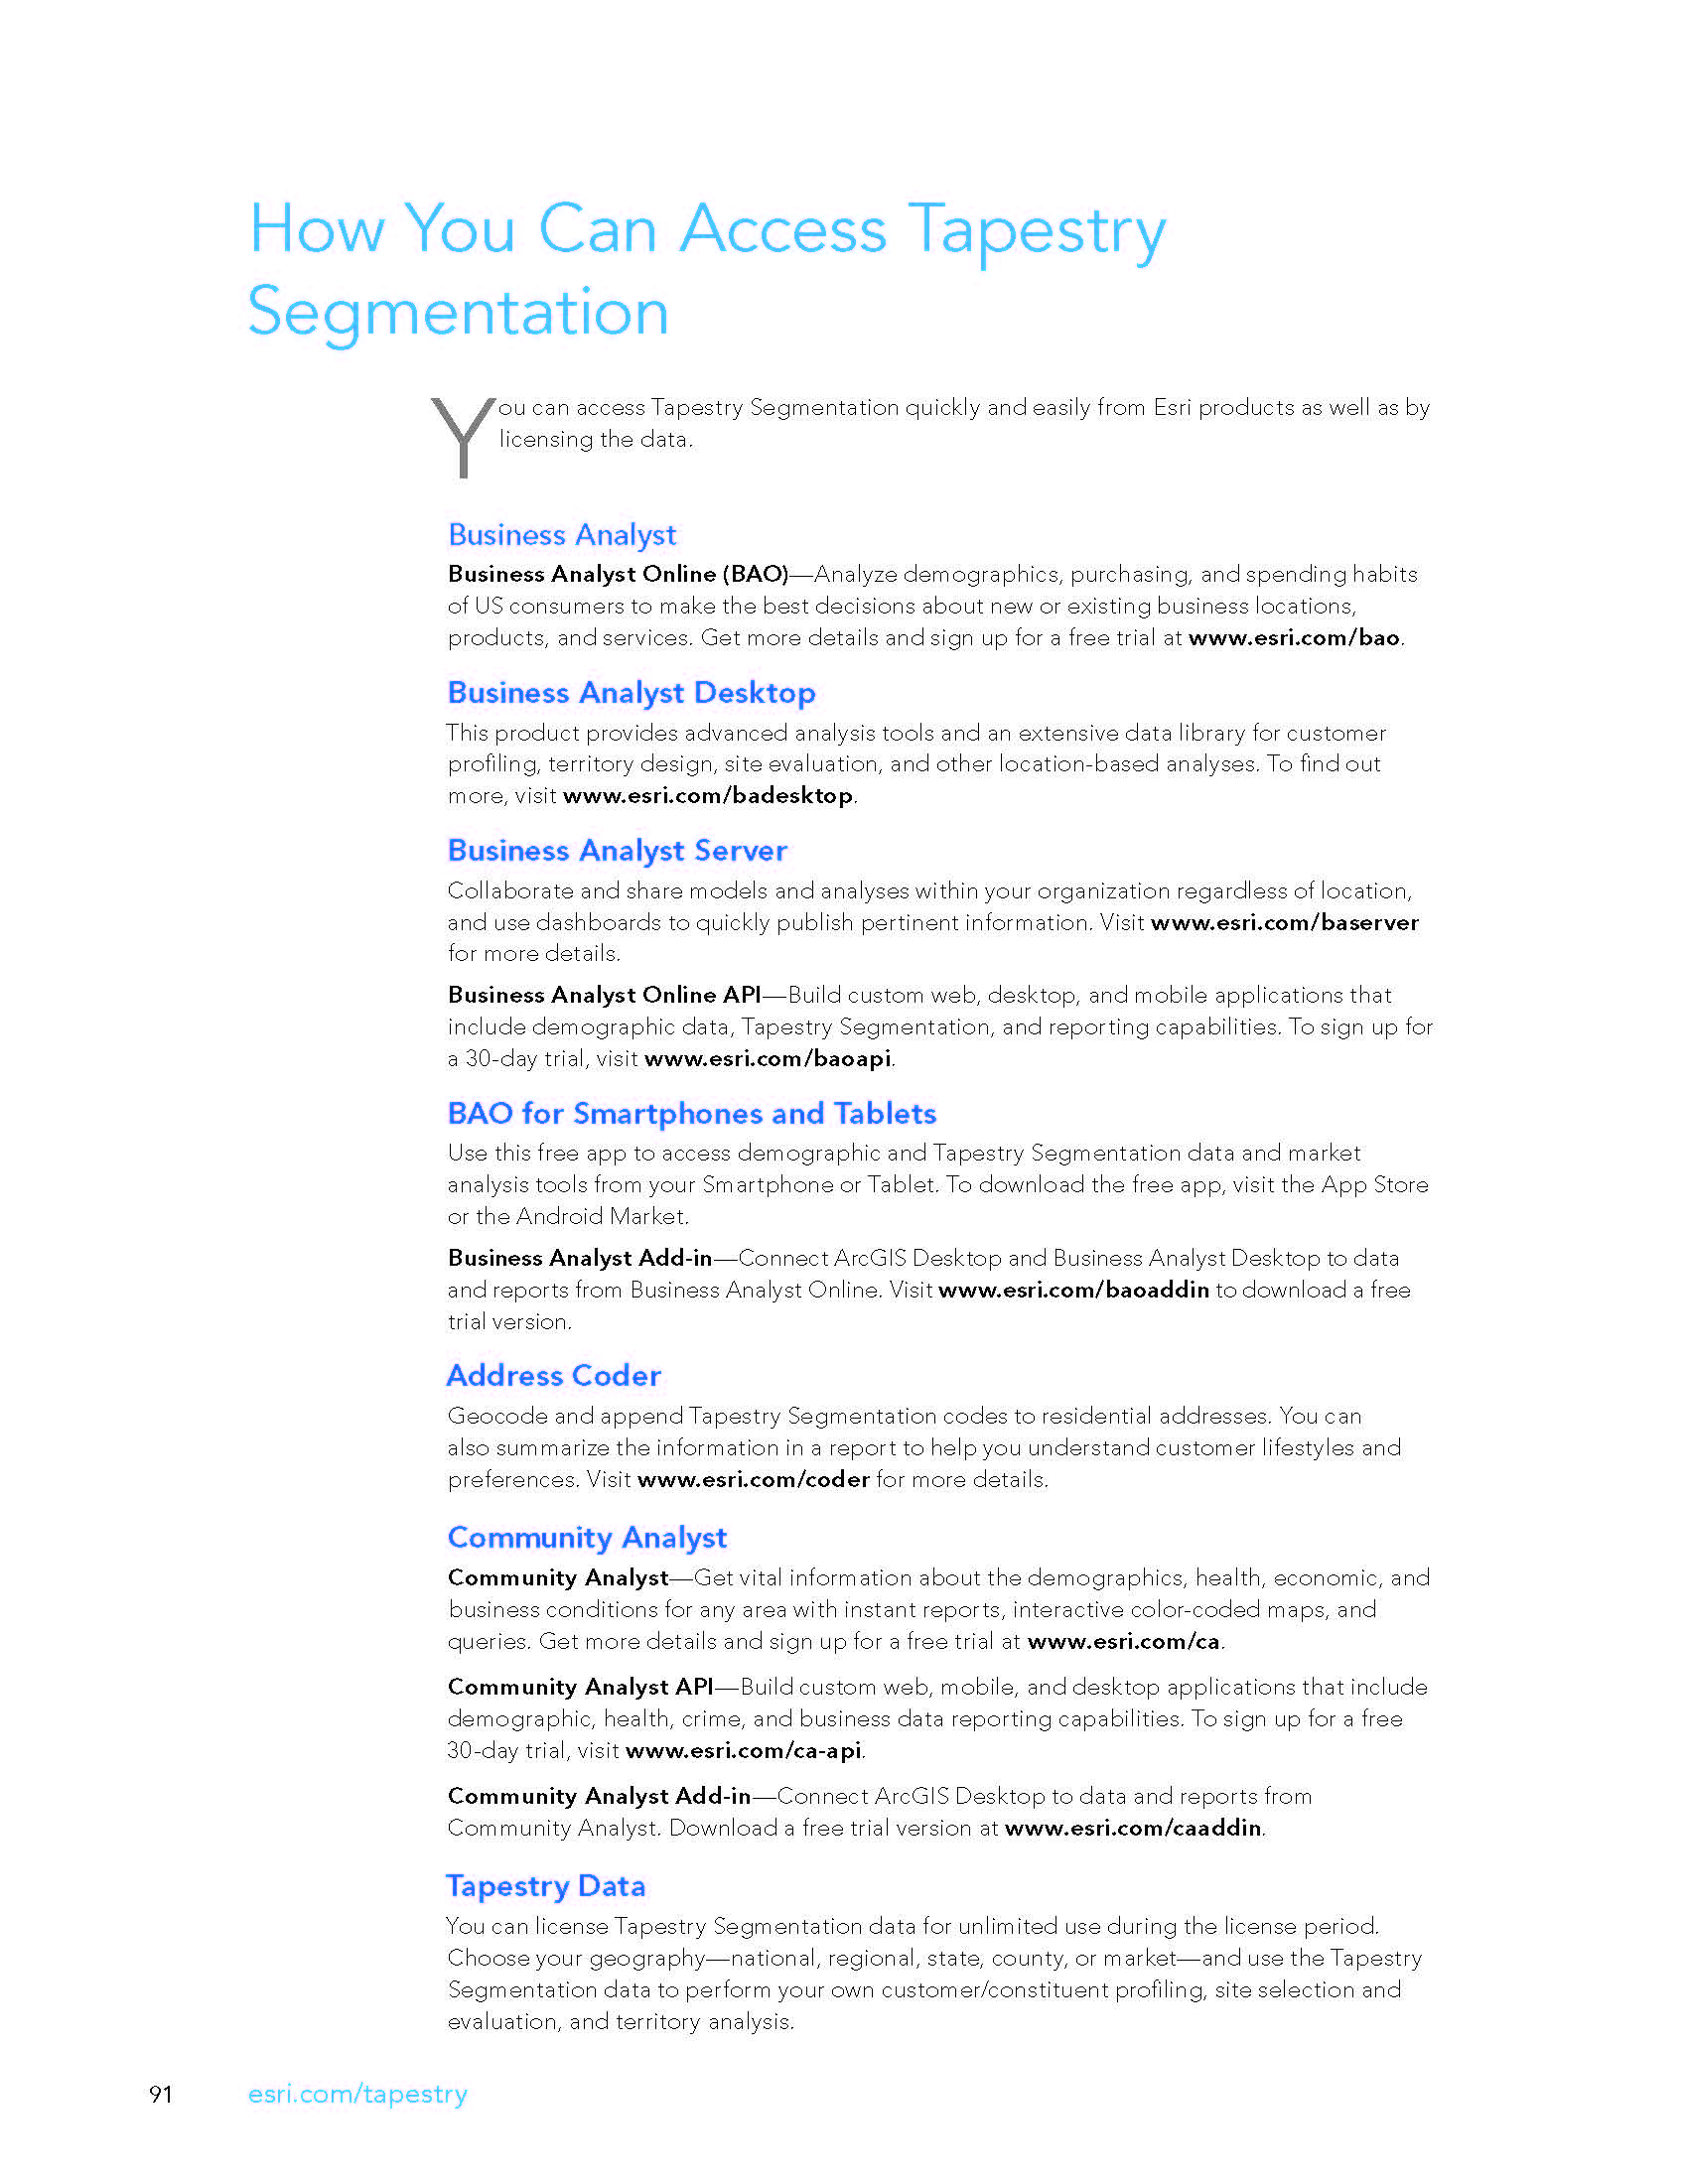 tapestry-segmentation_Page_94.jpg